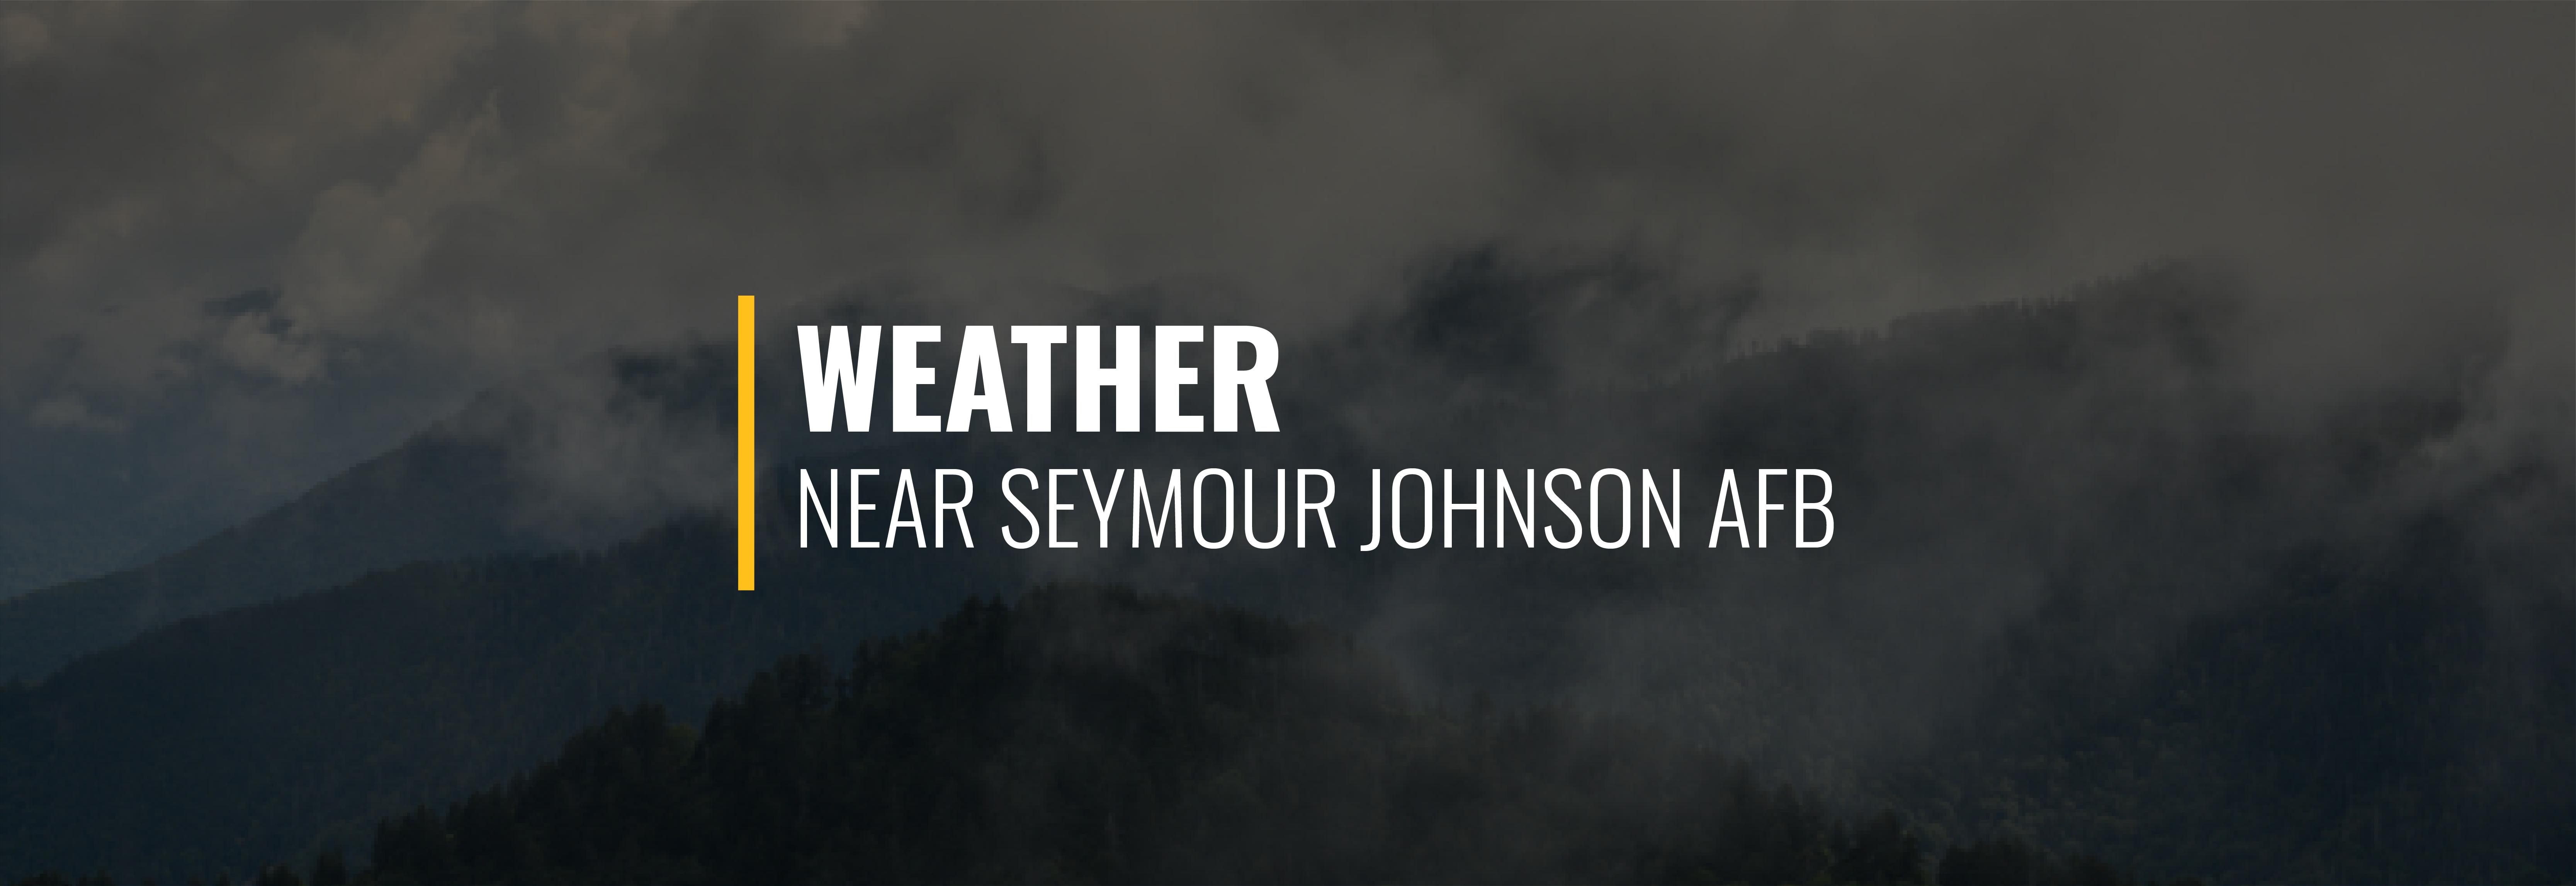 Seymour Johnson Air Force Base Weather